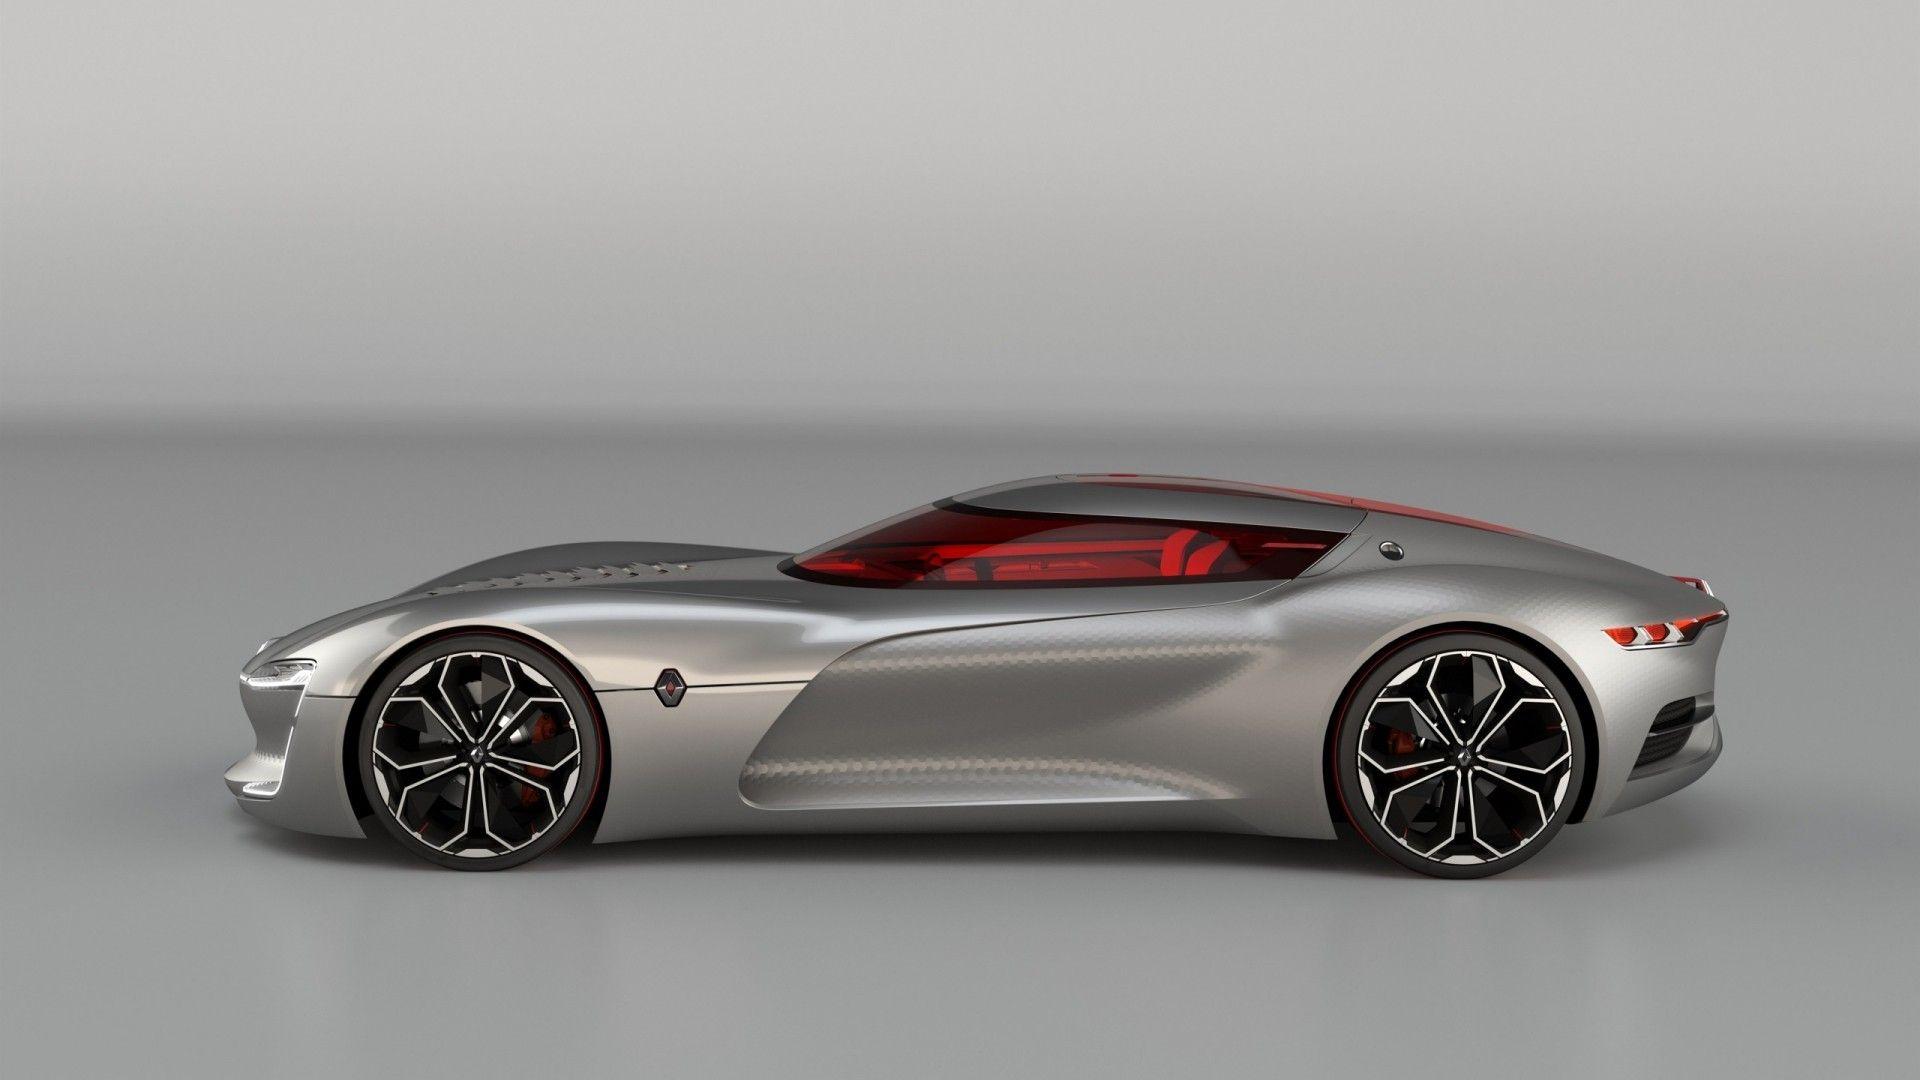 Wonderful General 1920x1080 Vehicle Car Sports Car Renault Reanault Trezor Concept Cars  Futuristic Carbon Fiber Amazing Design